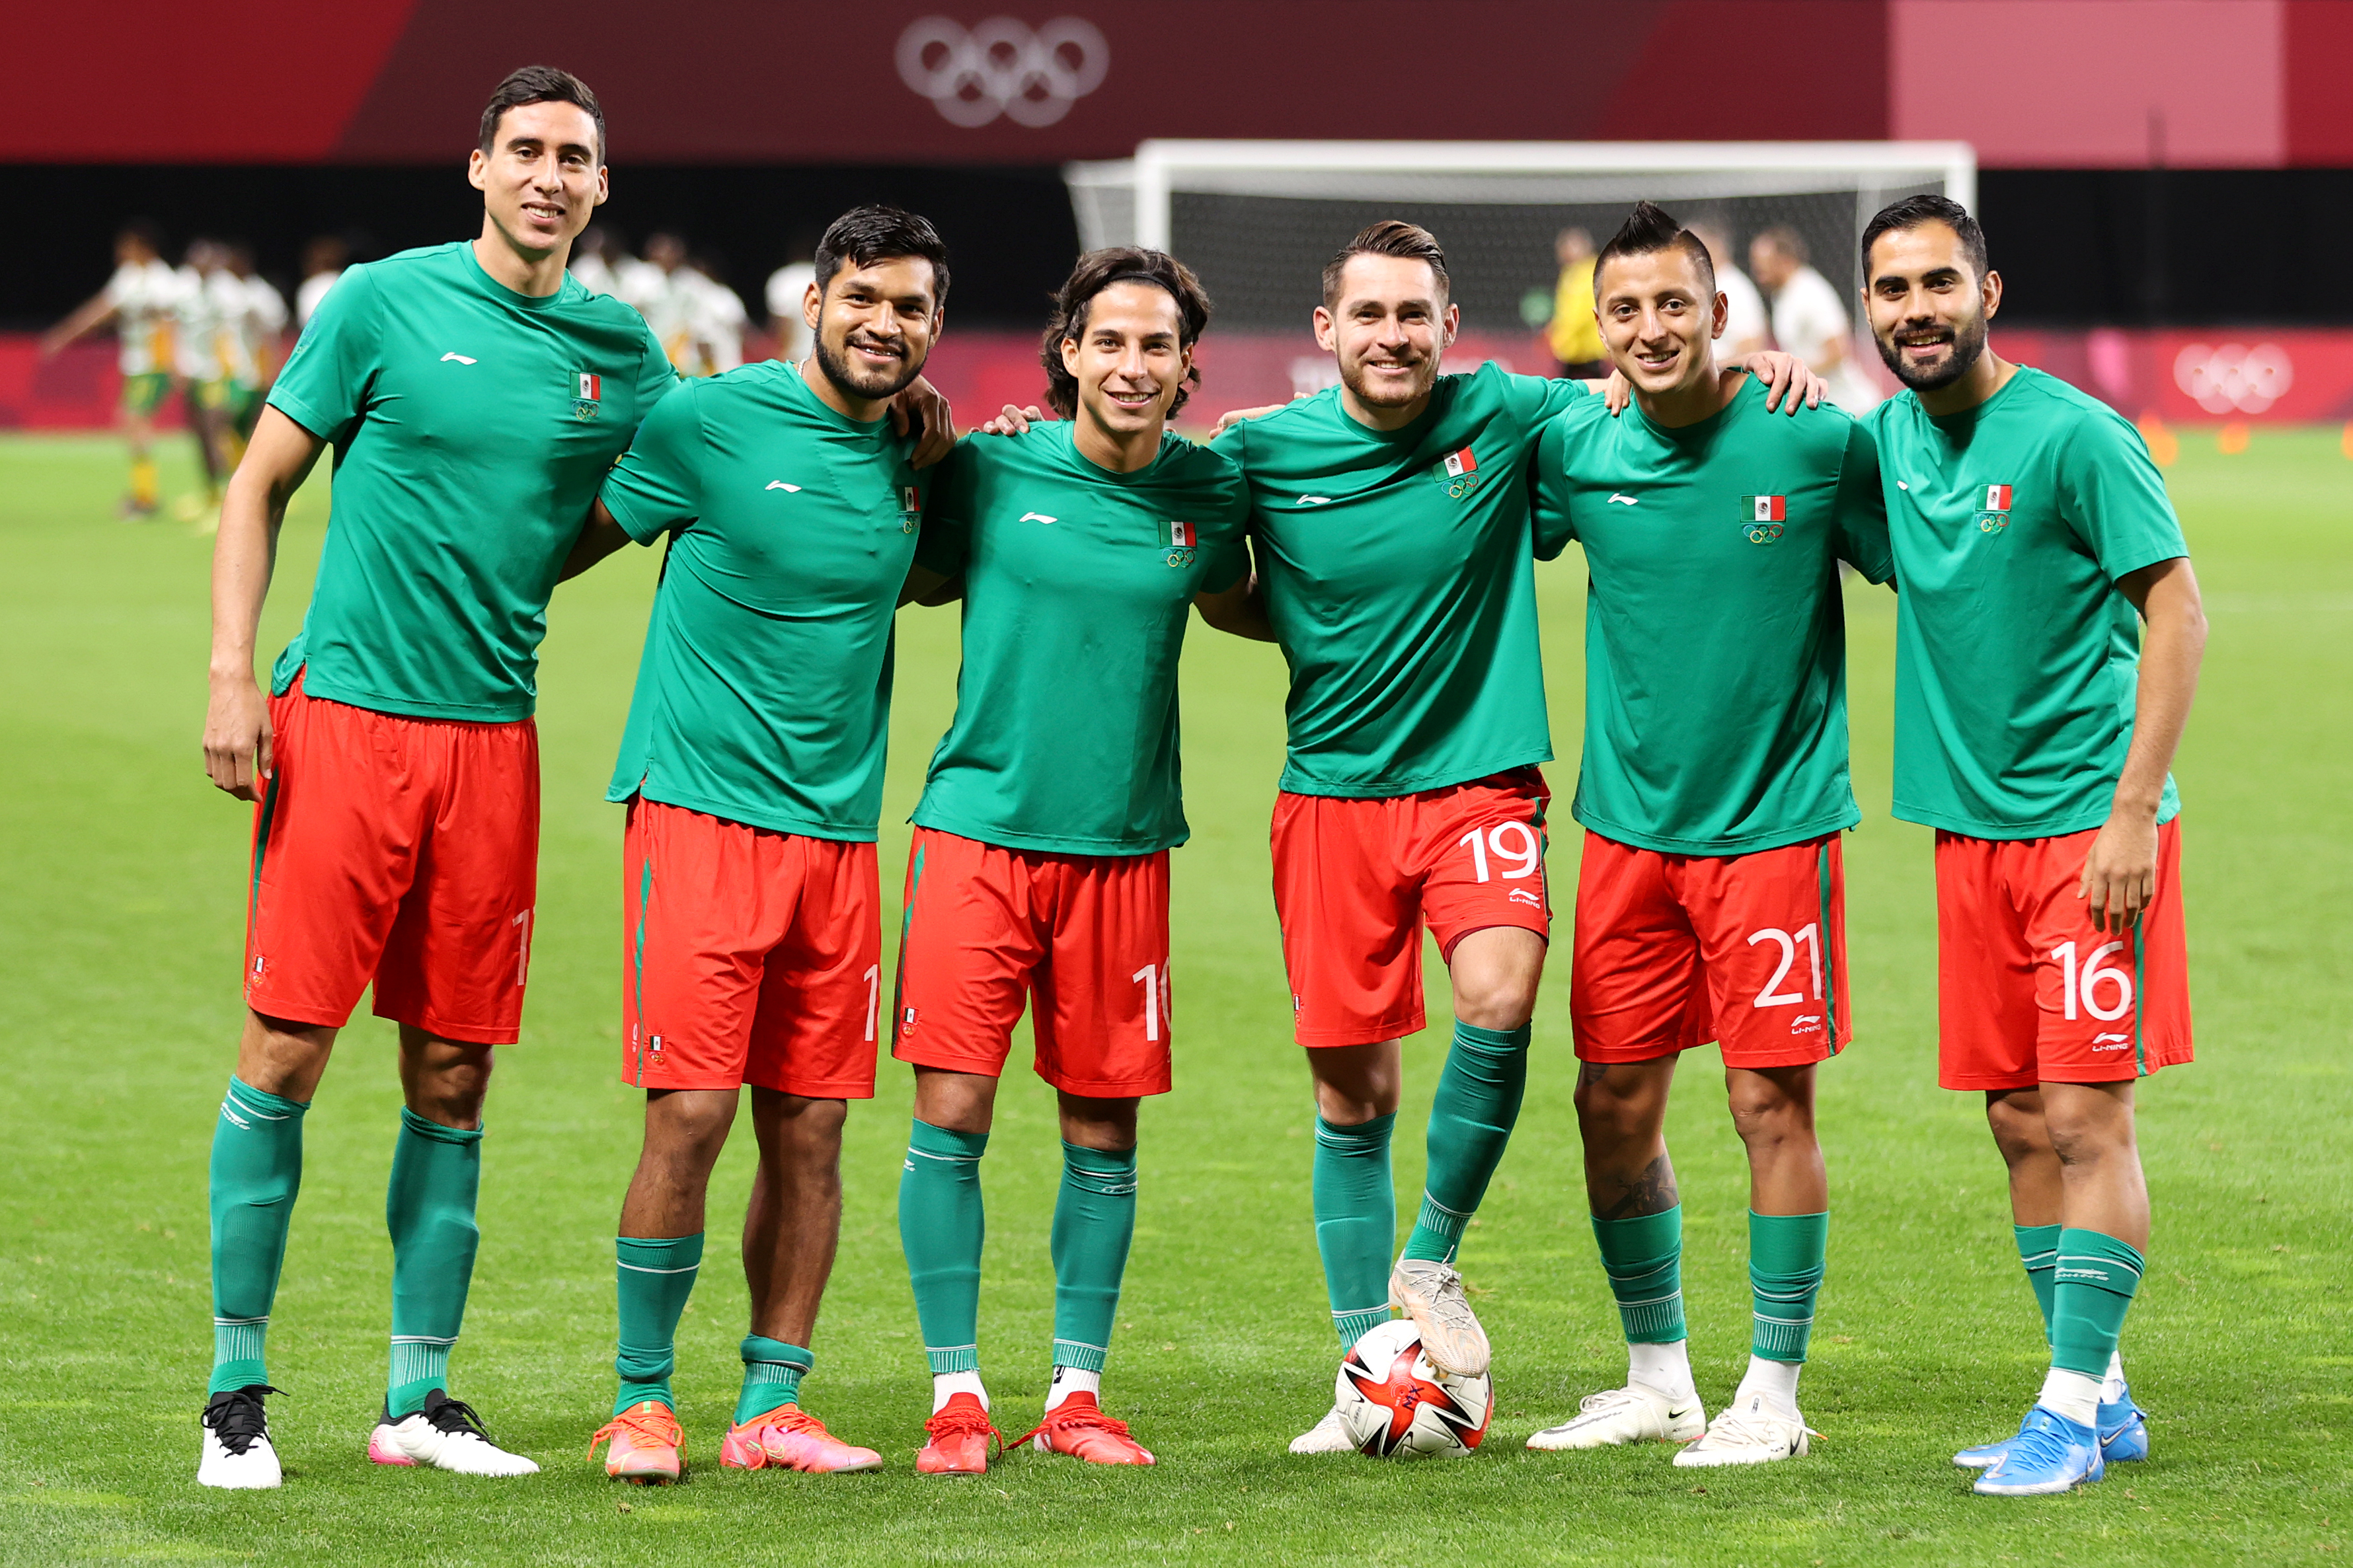 South Africa v Mexico: Men's Football - Olympics: Day 5